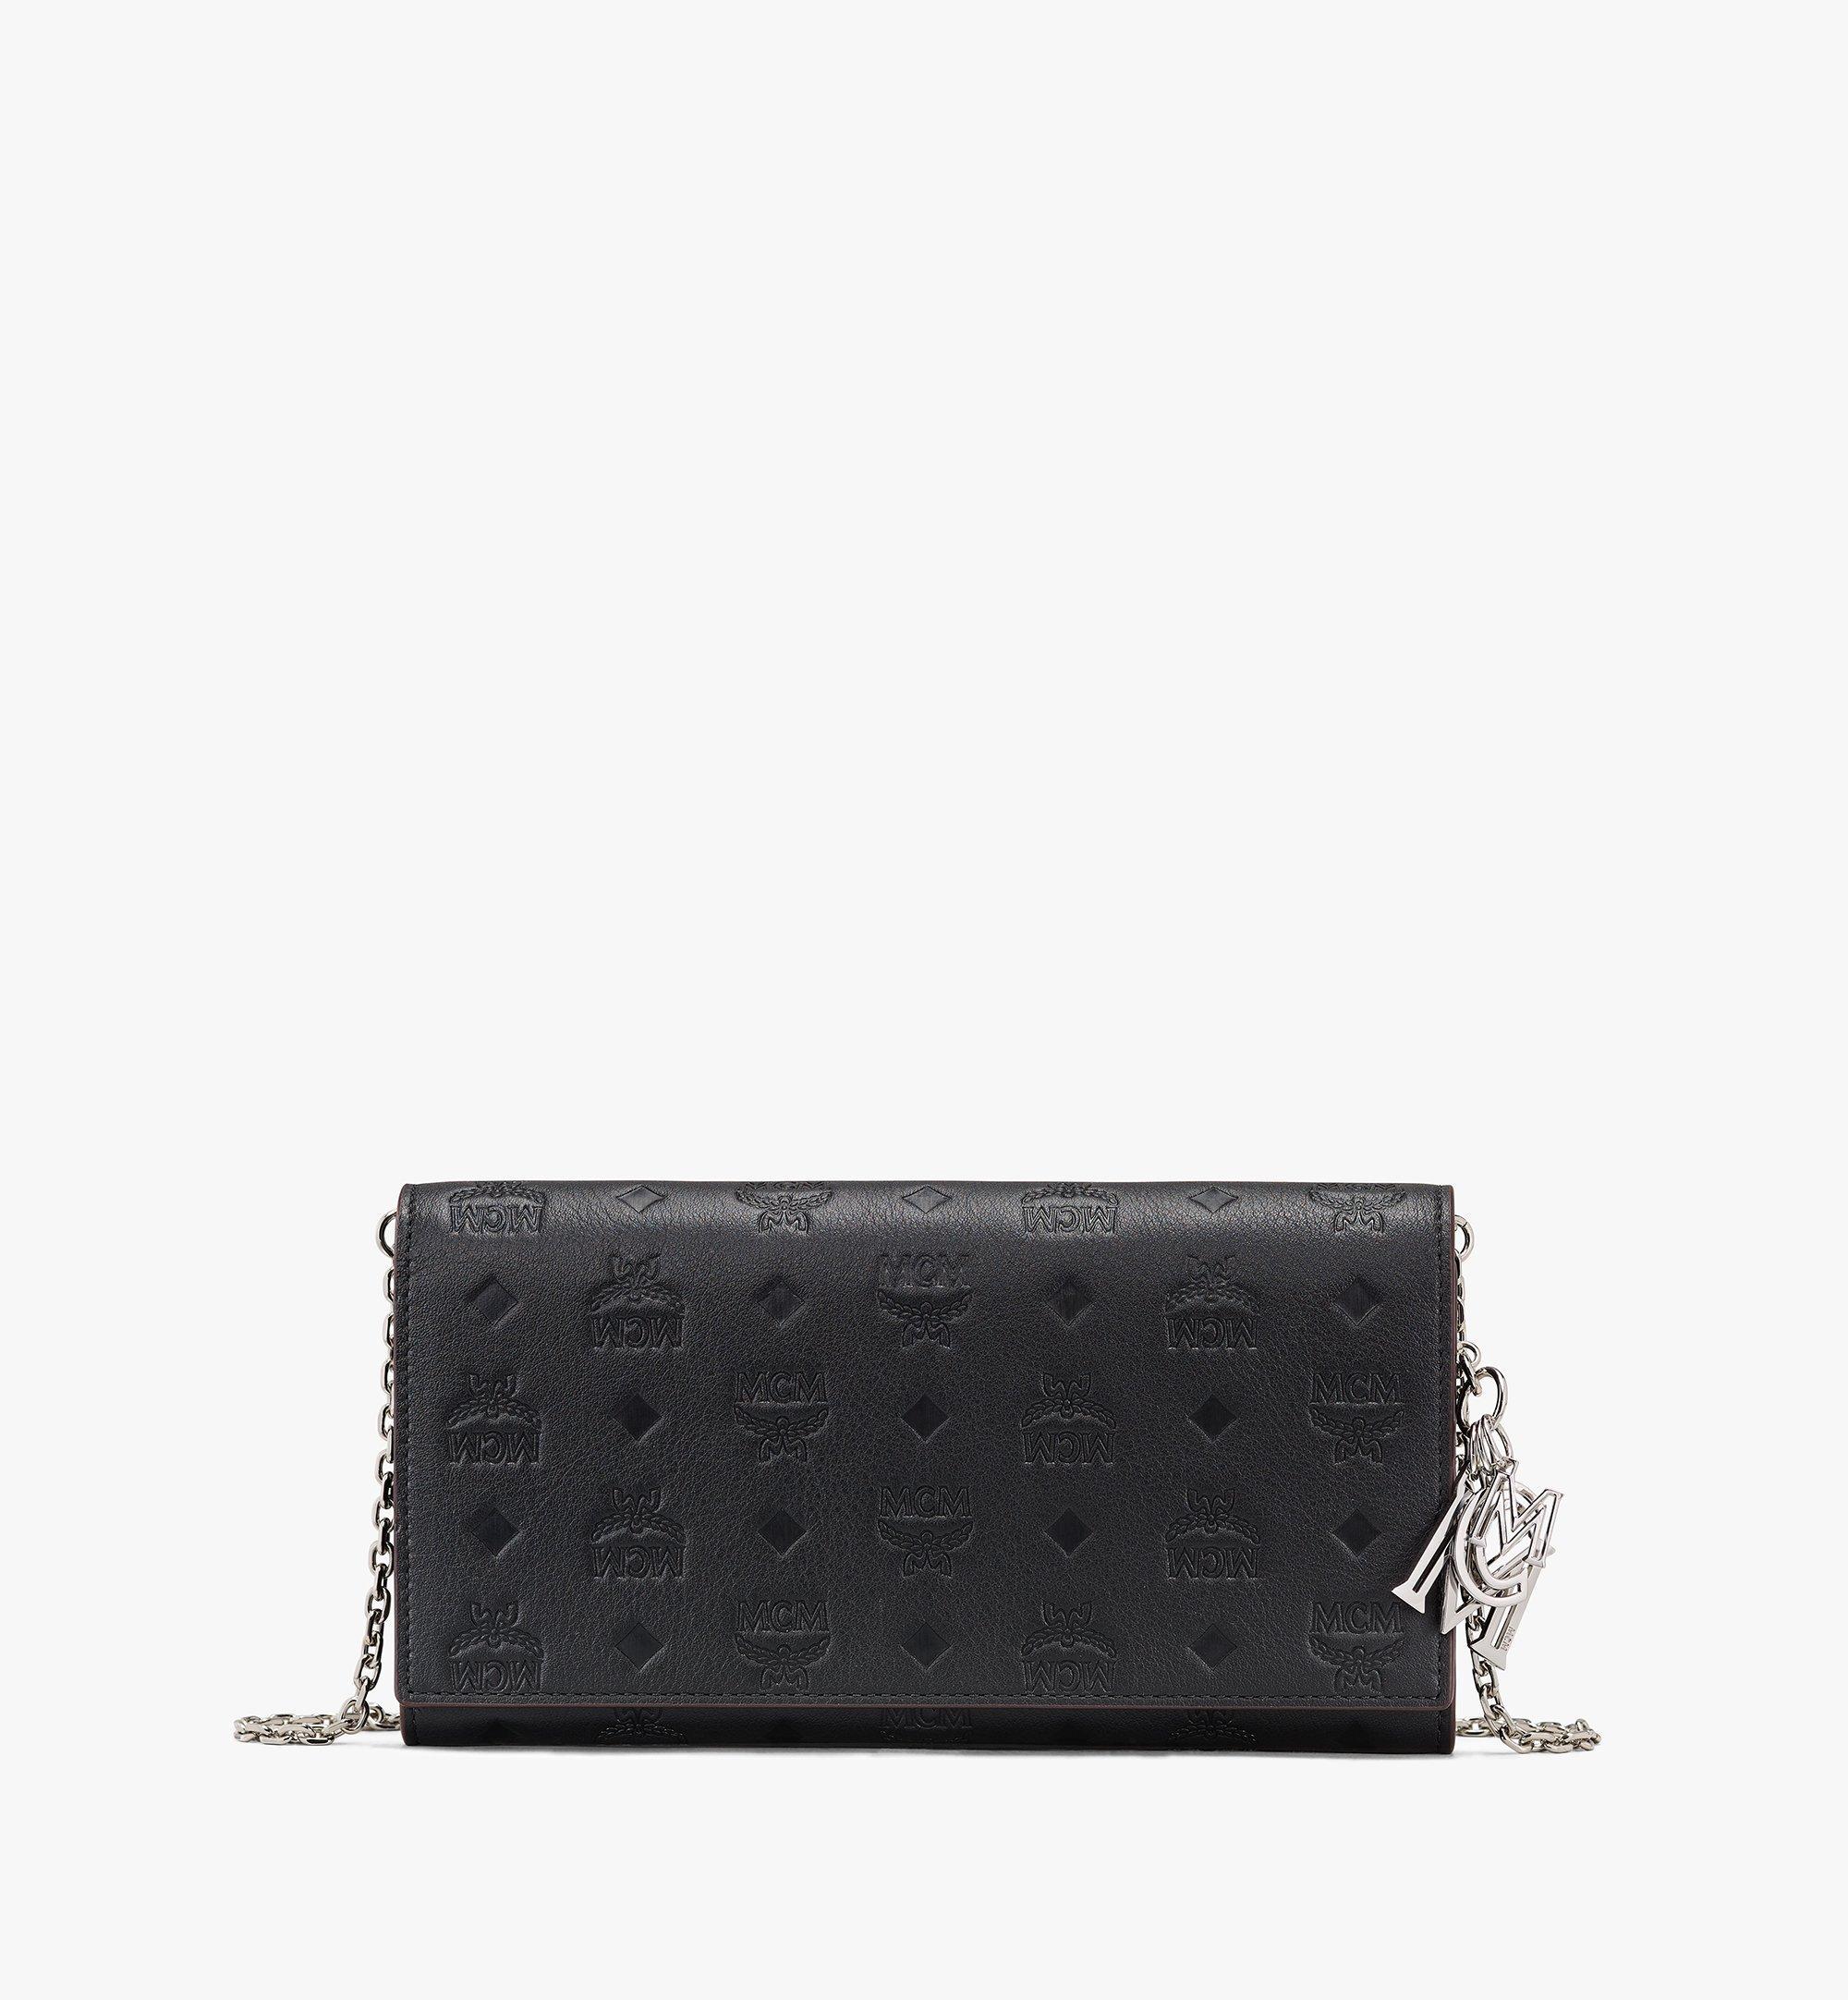 MCM Klara Chain Wallet in Monogram Leather Black MYLASKM01BK001 Alternate View 1